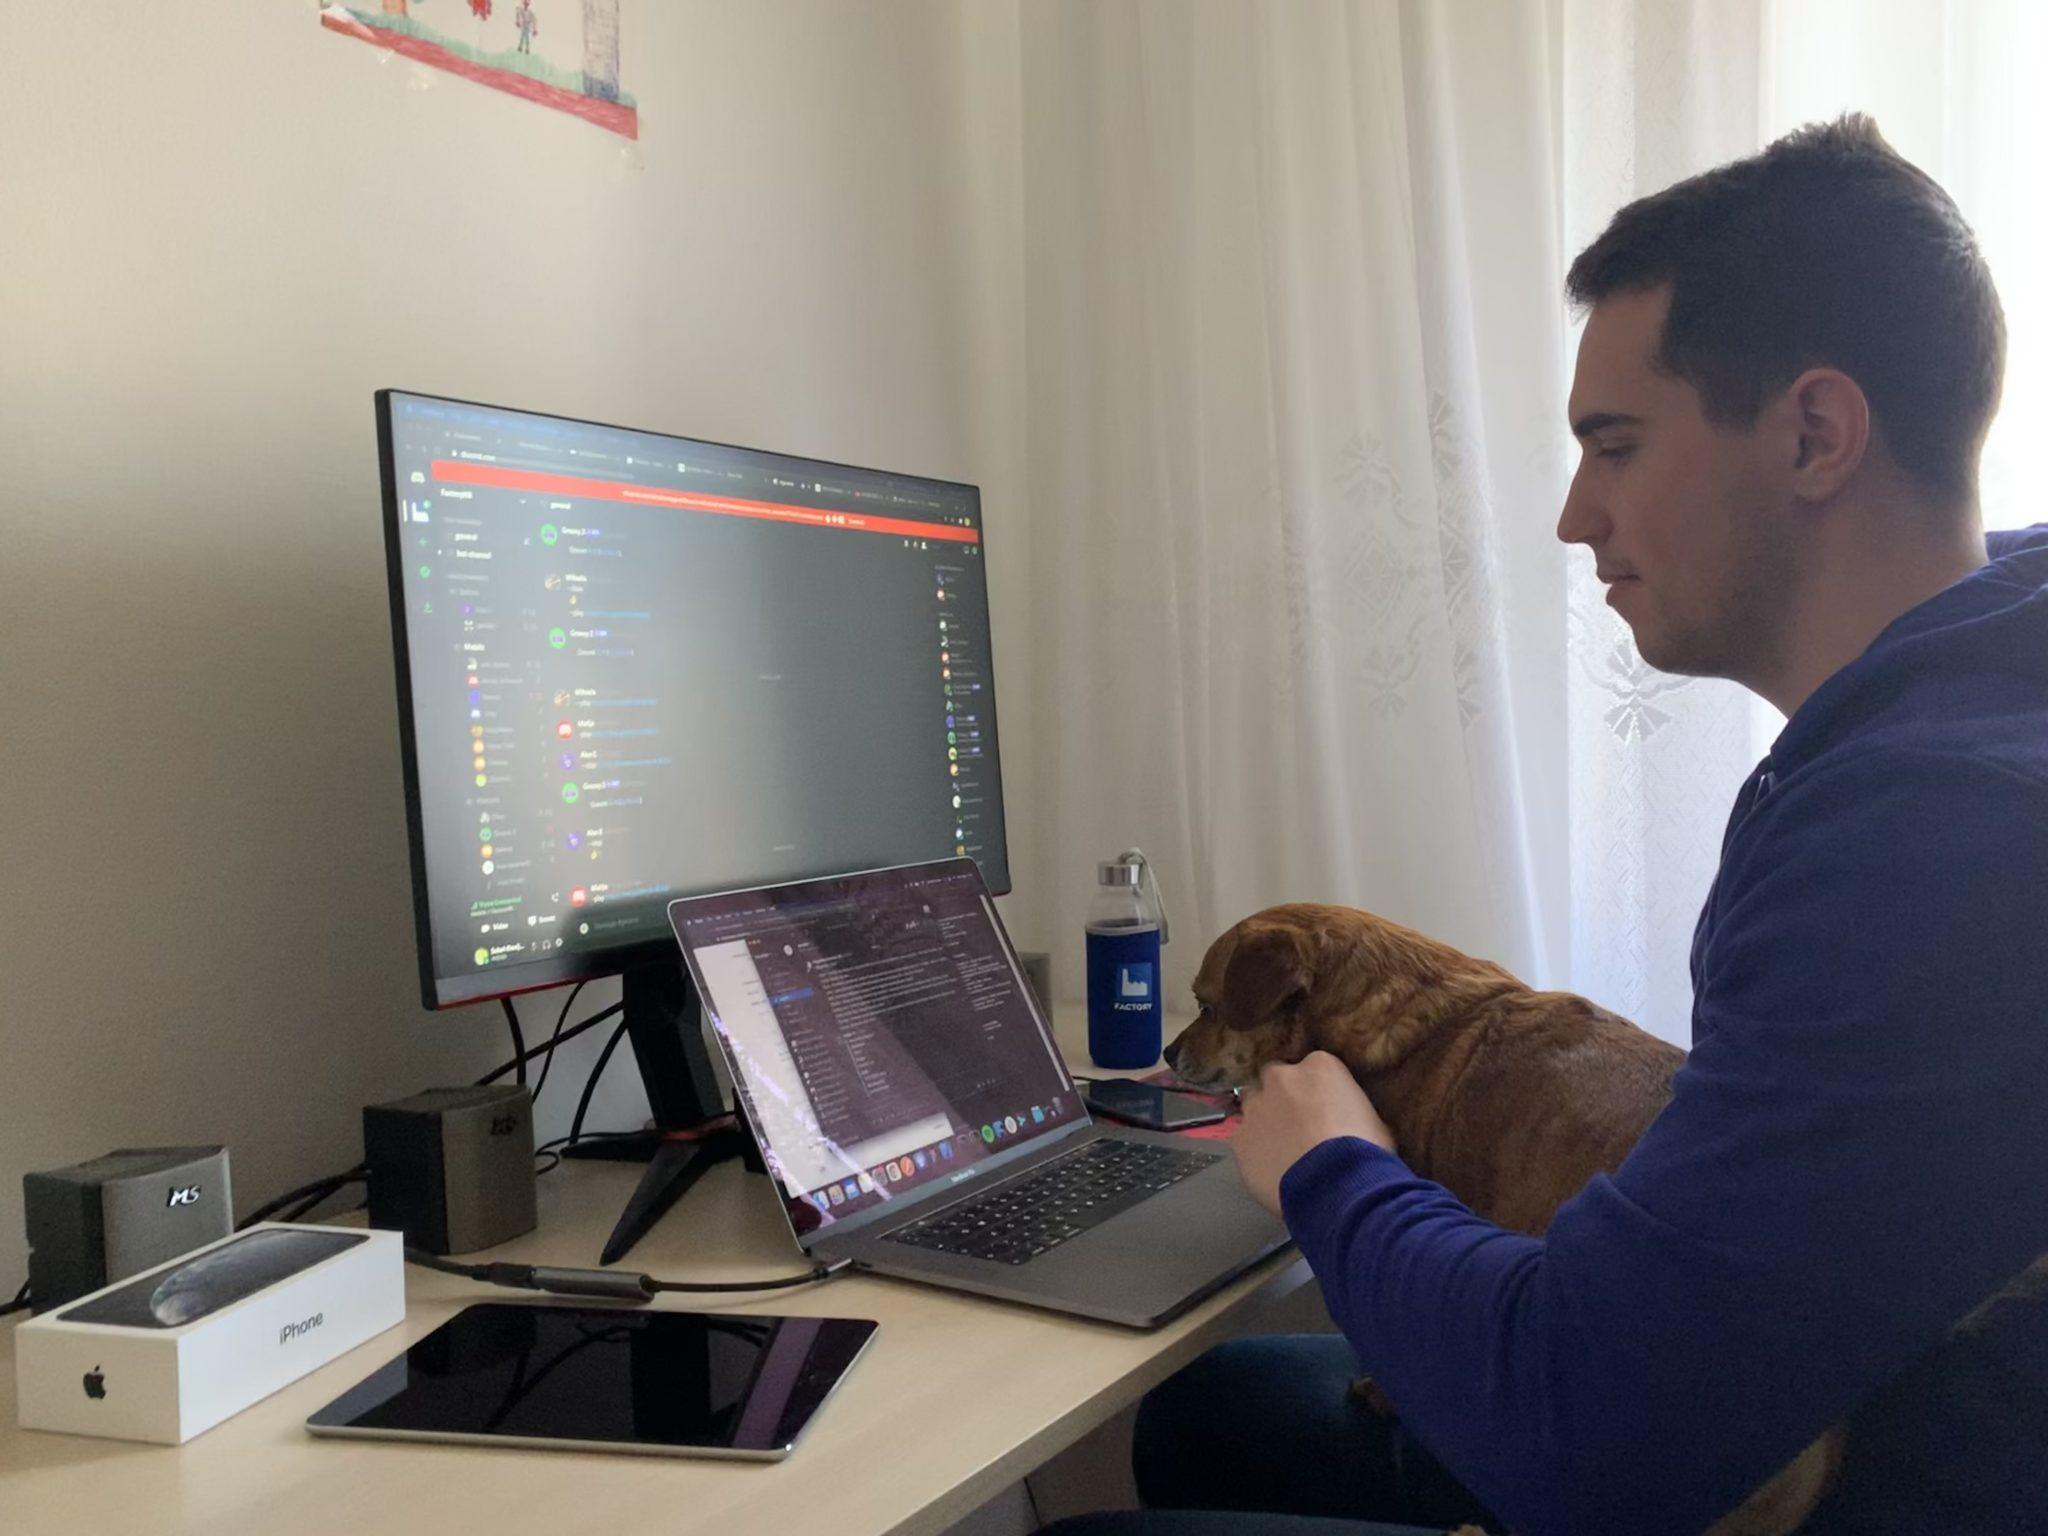 Iskustva s Factory iOS akademije - Zvonimir